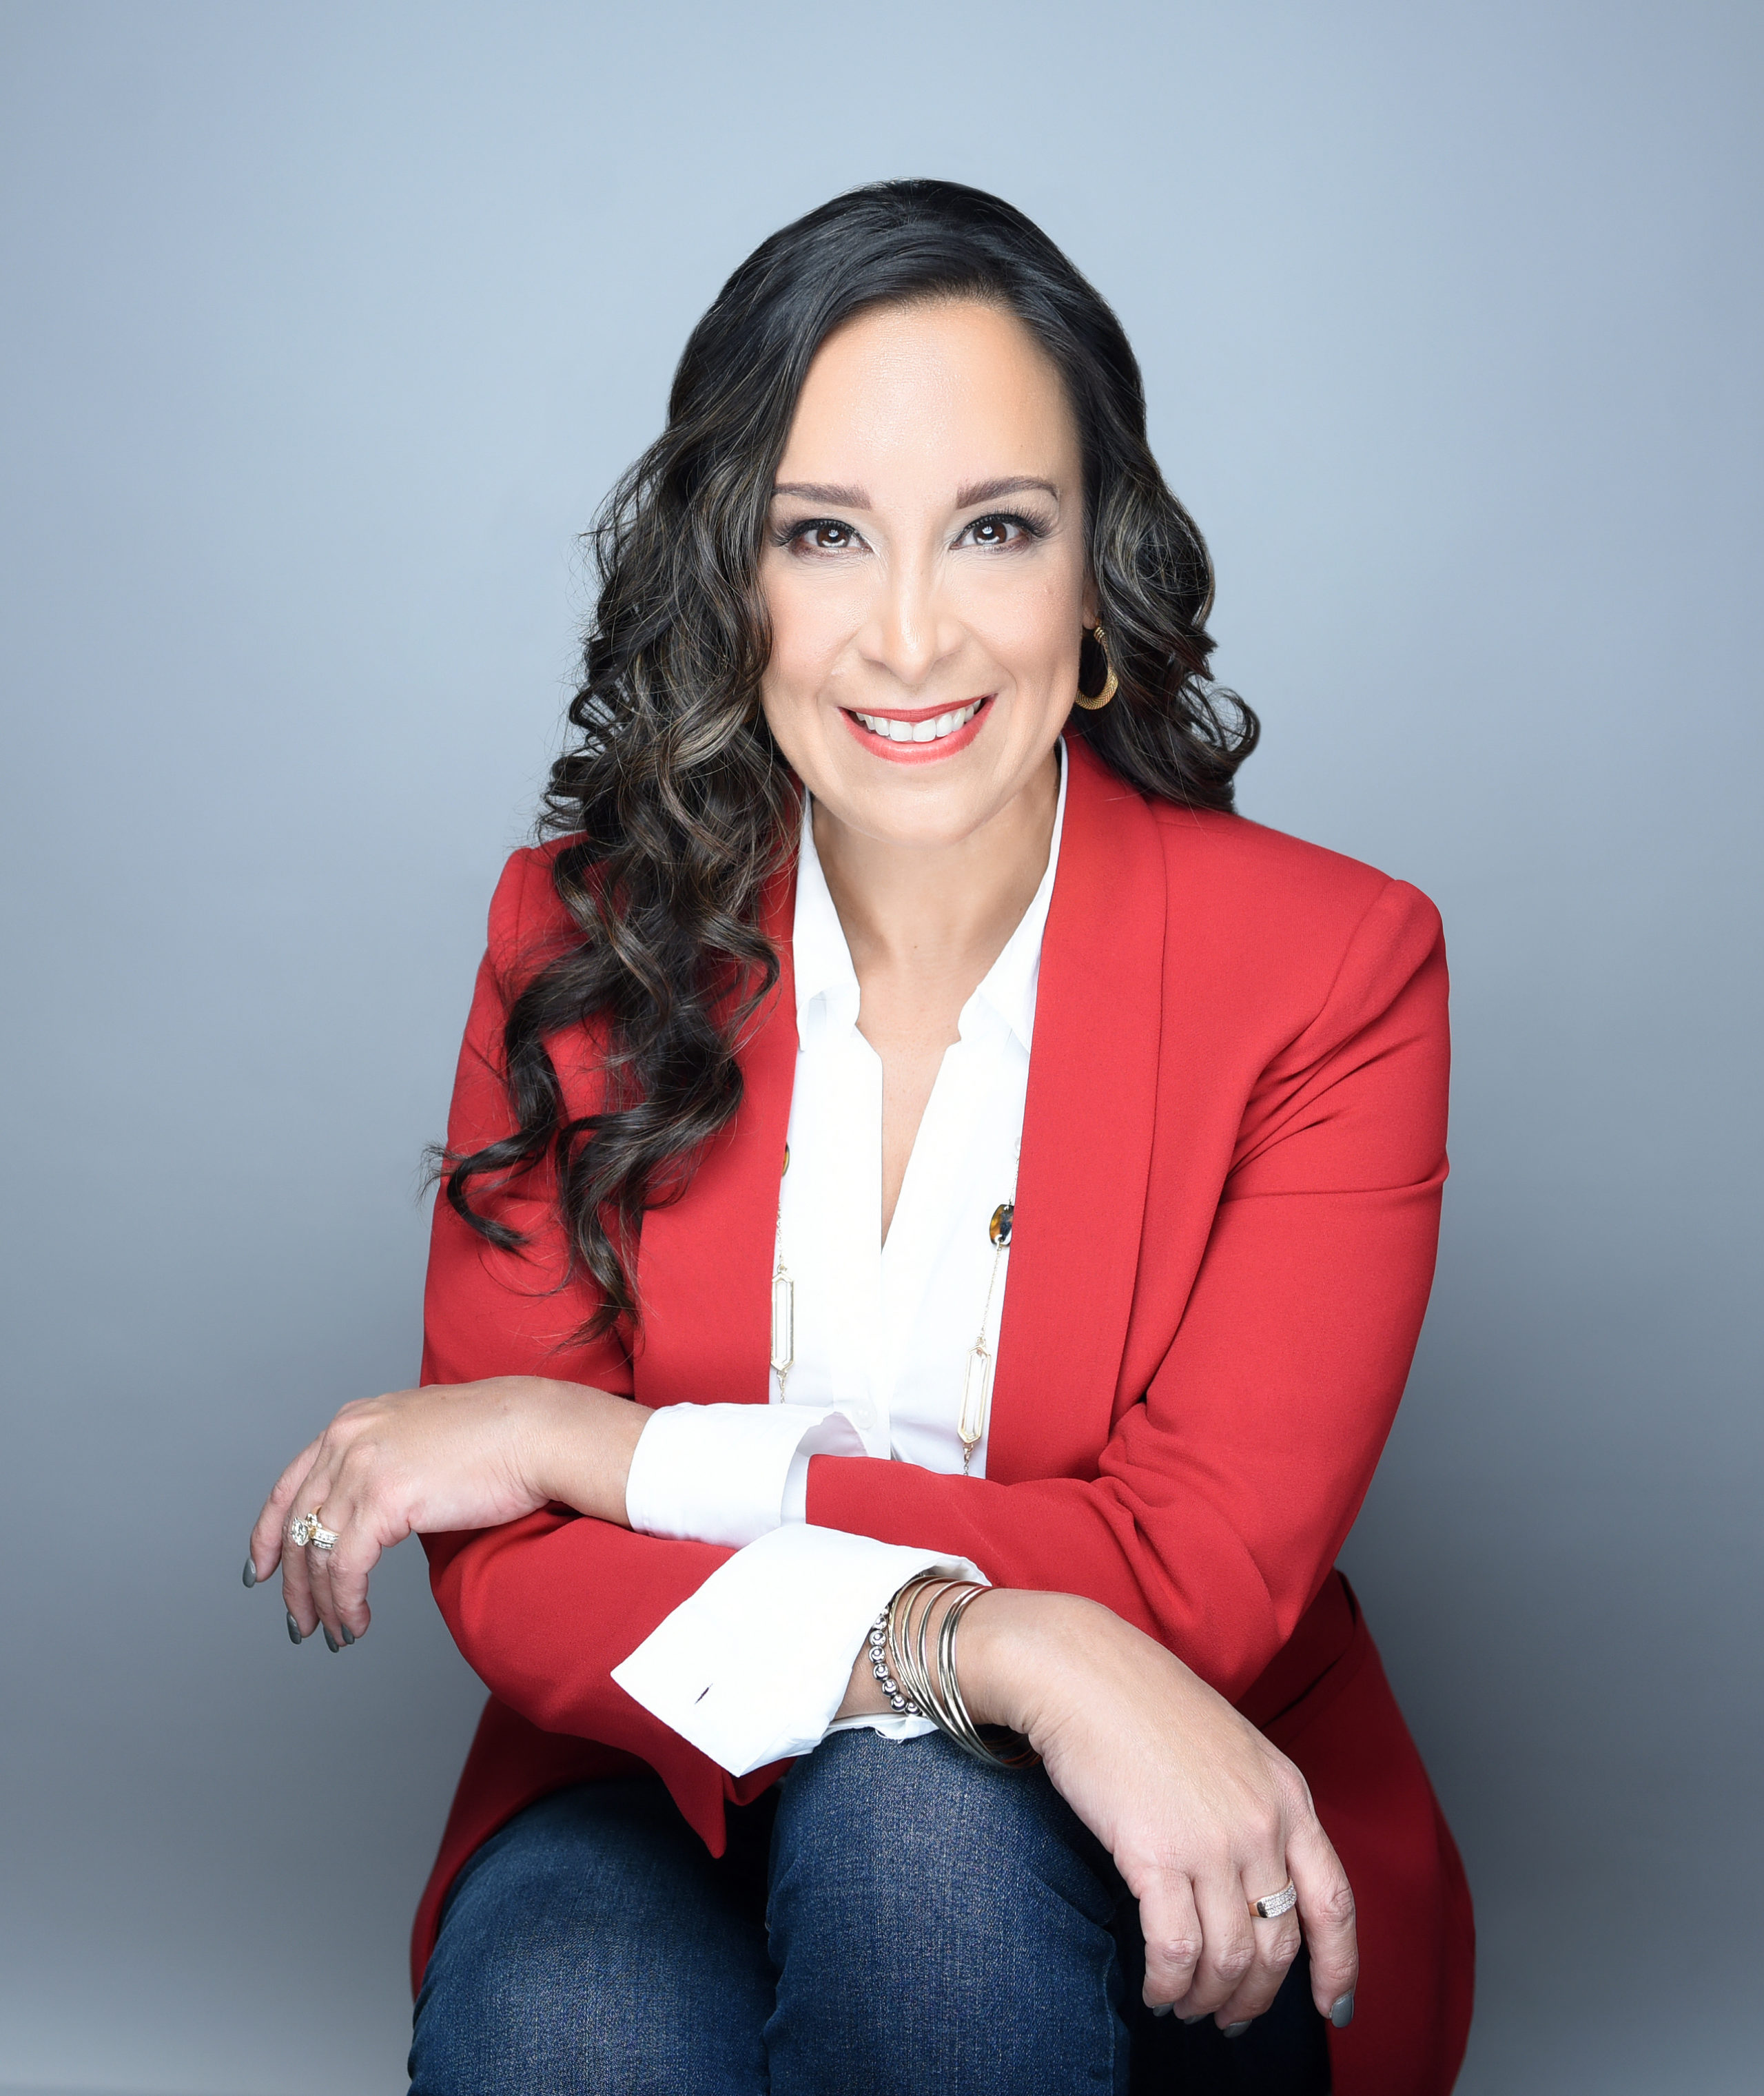 Republican Texas candidate Monica De La Cruz-Hernandez